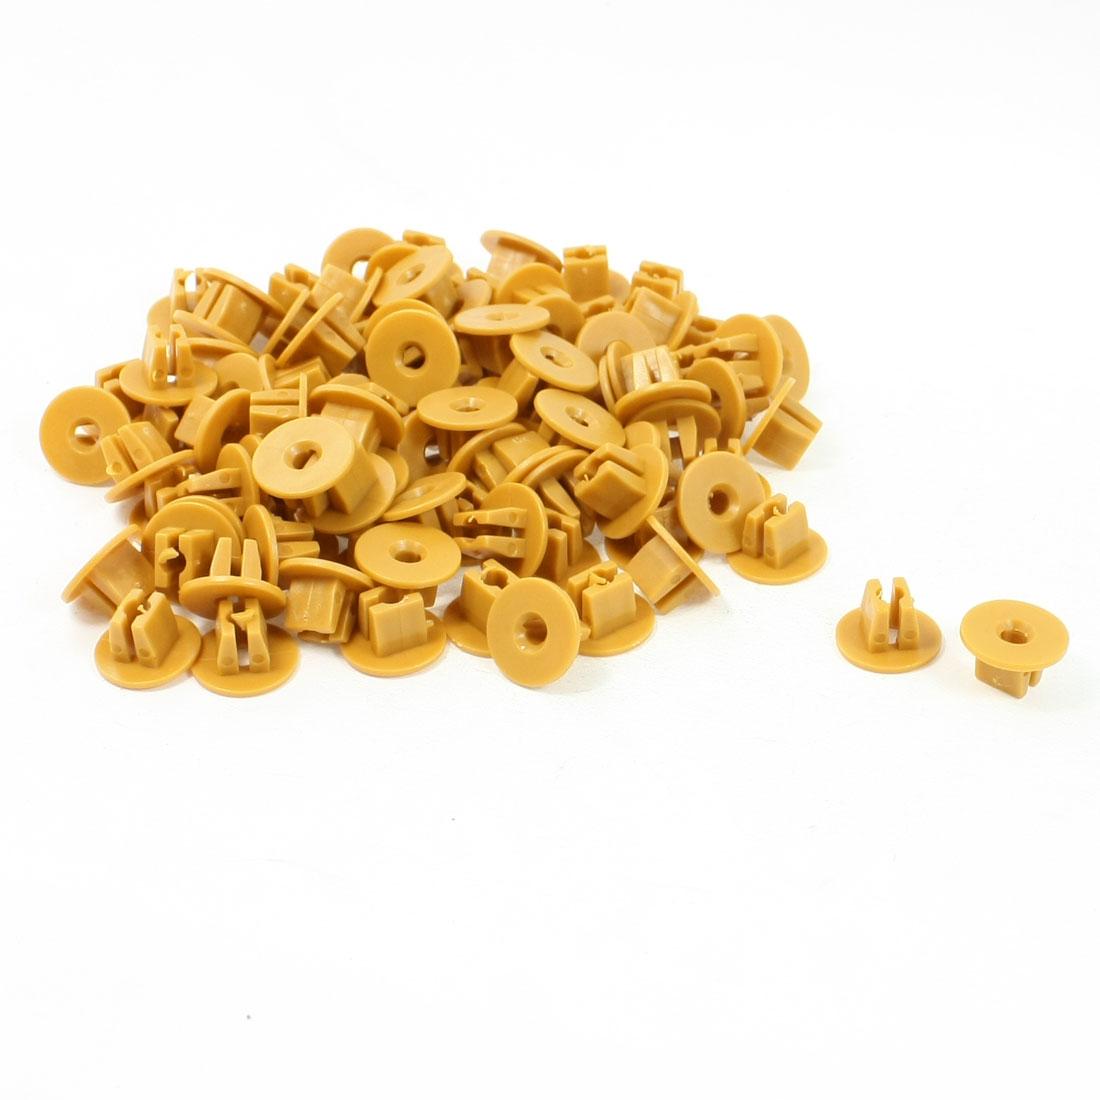 100 Pcs Auto Car Door Fender 9x8mm Hole Push Plastic Rivets Fastener Yellow